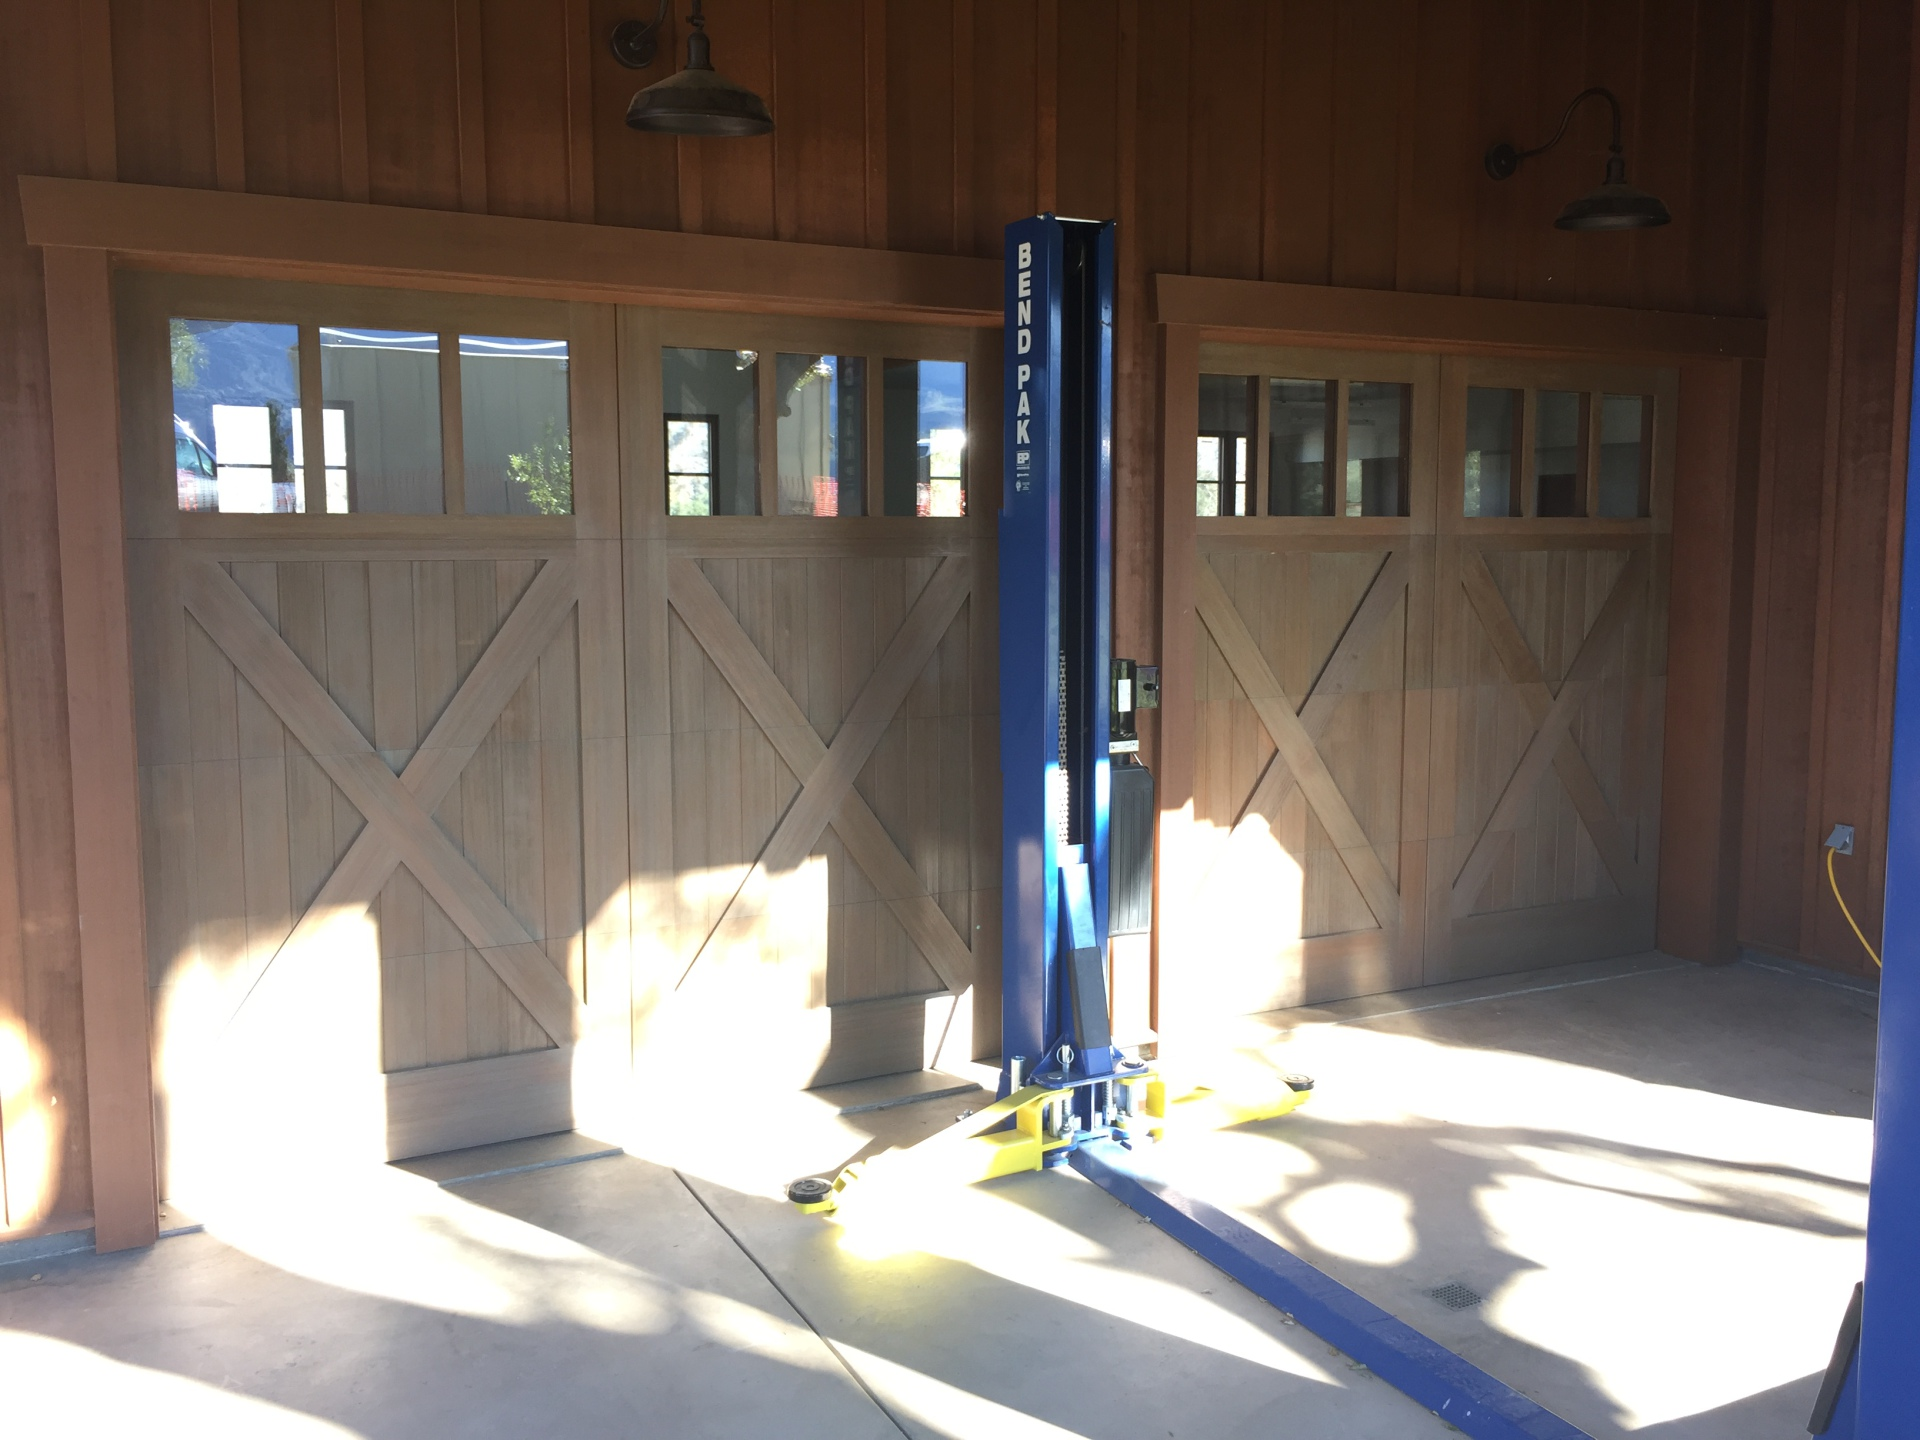 Carriage House Doors custom wood doors with custom track